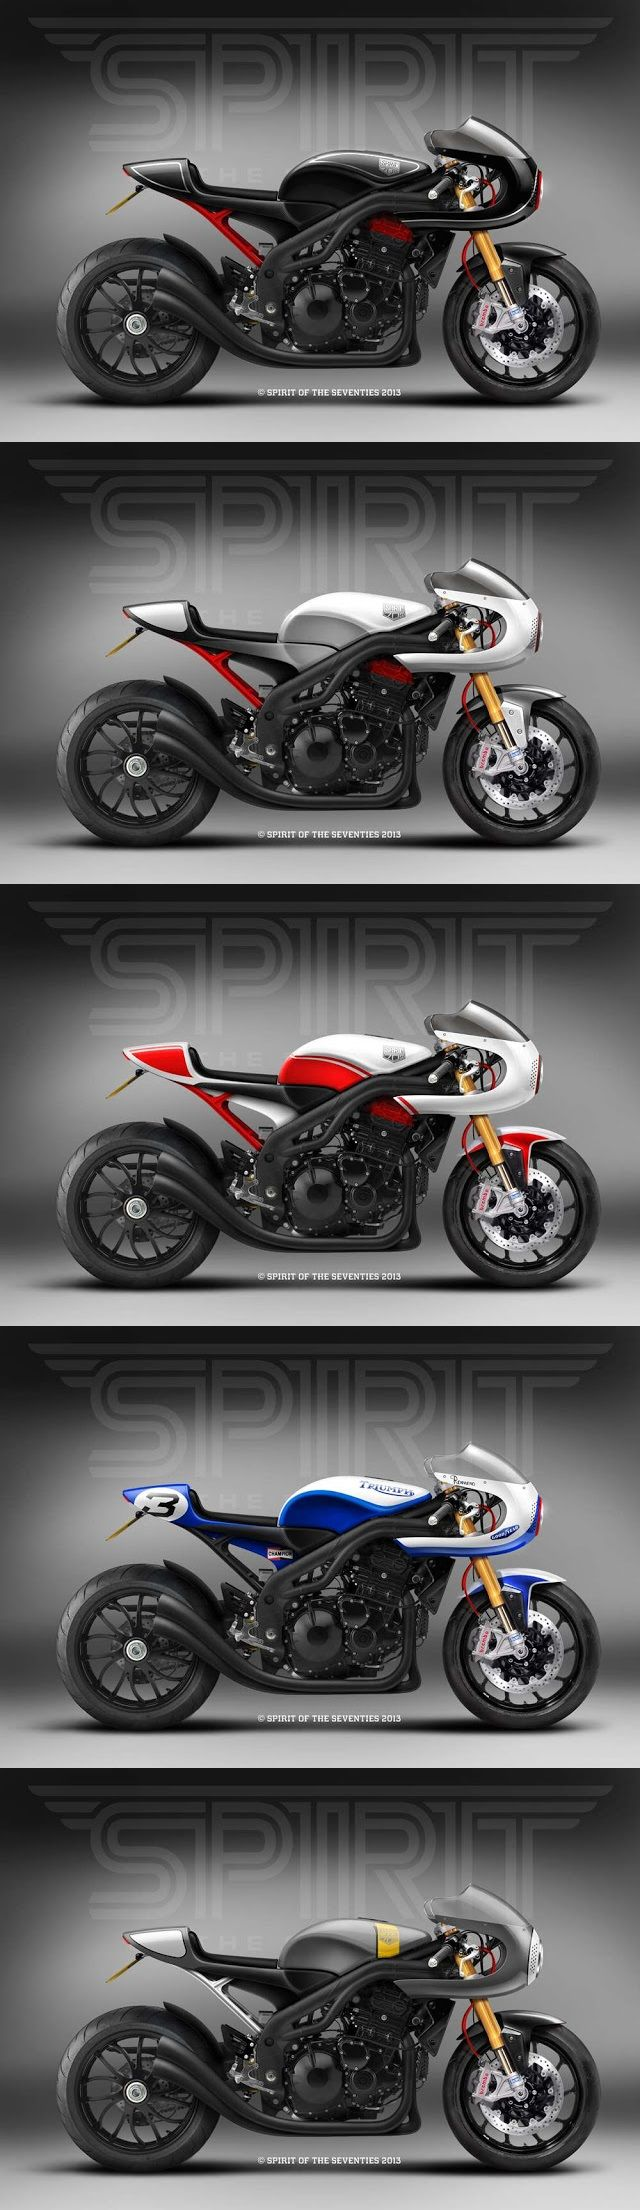 Speed Triple Racer concept